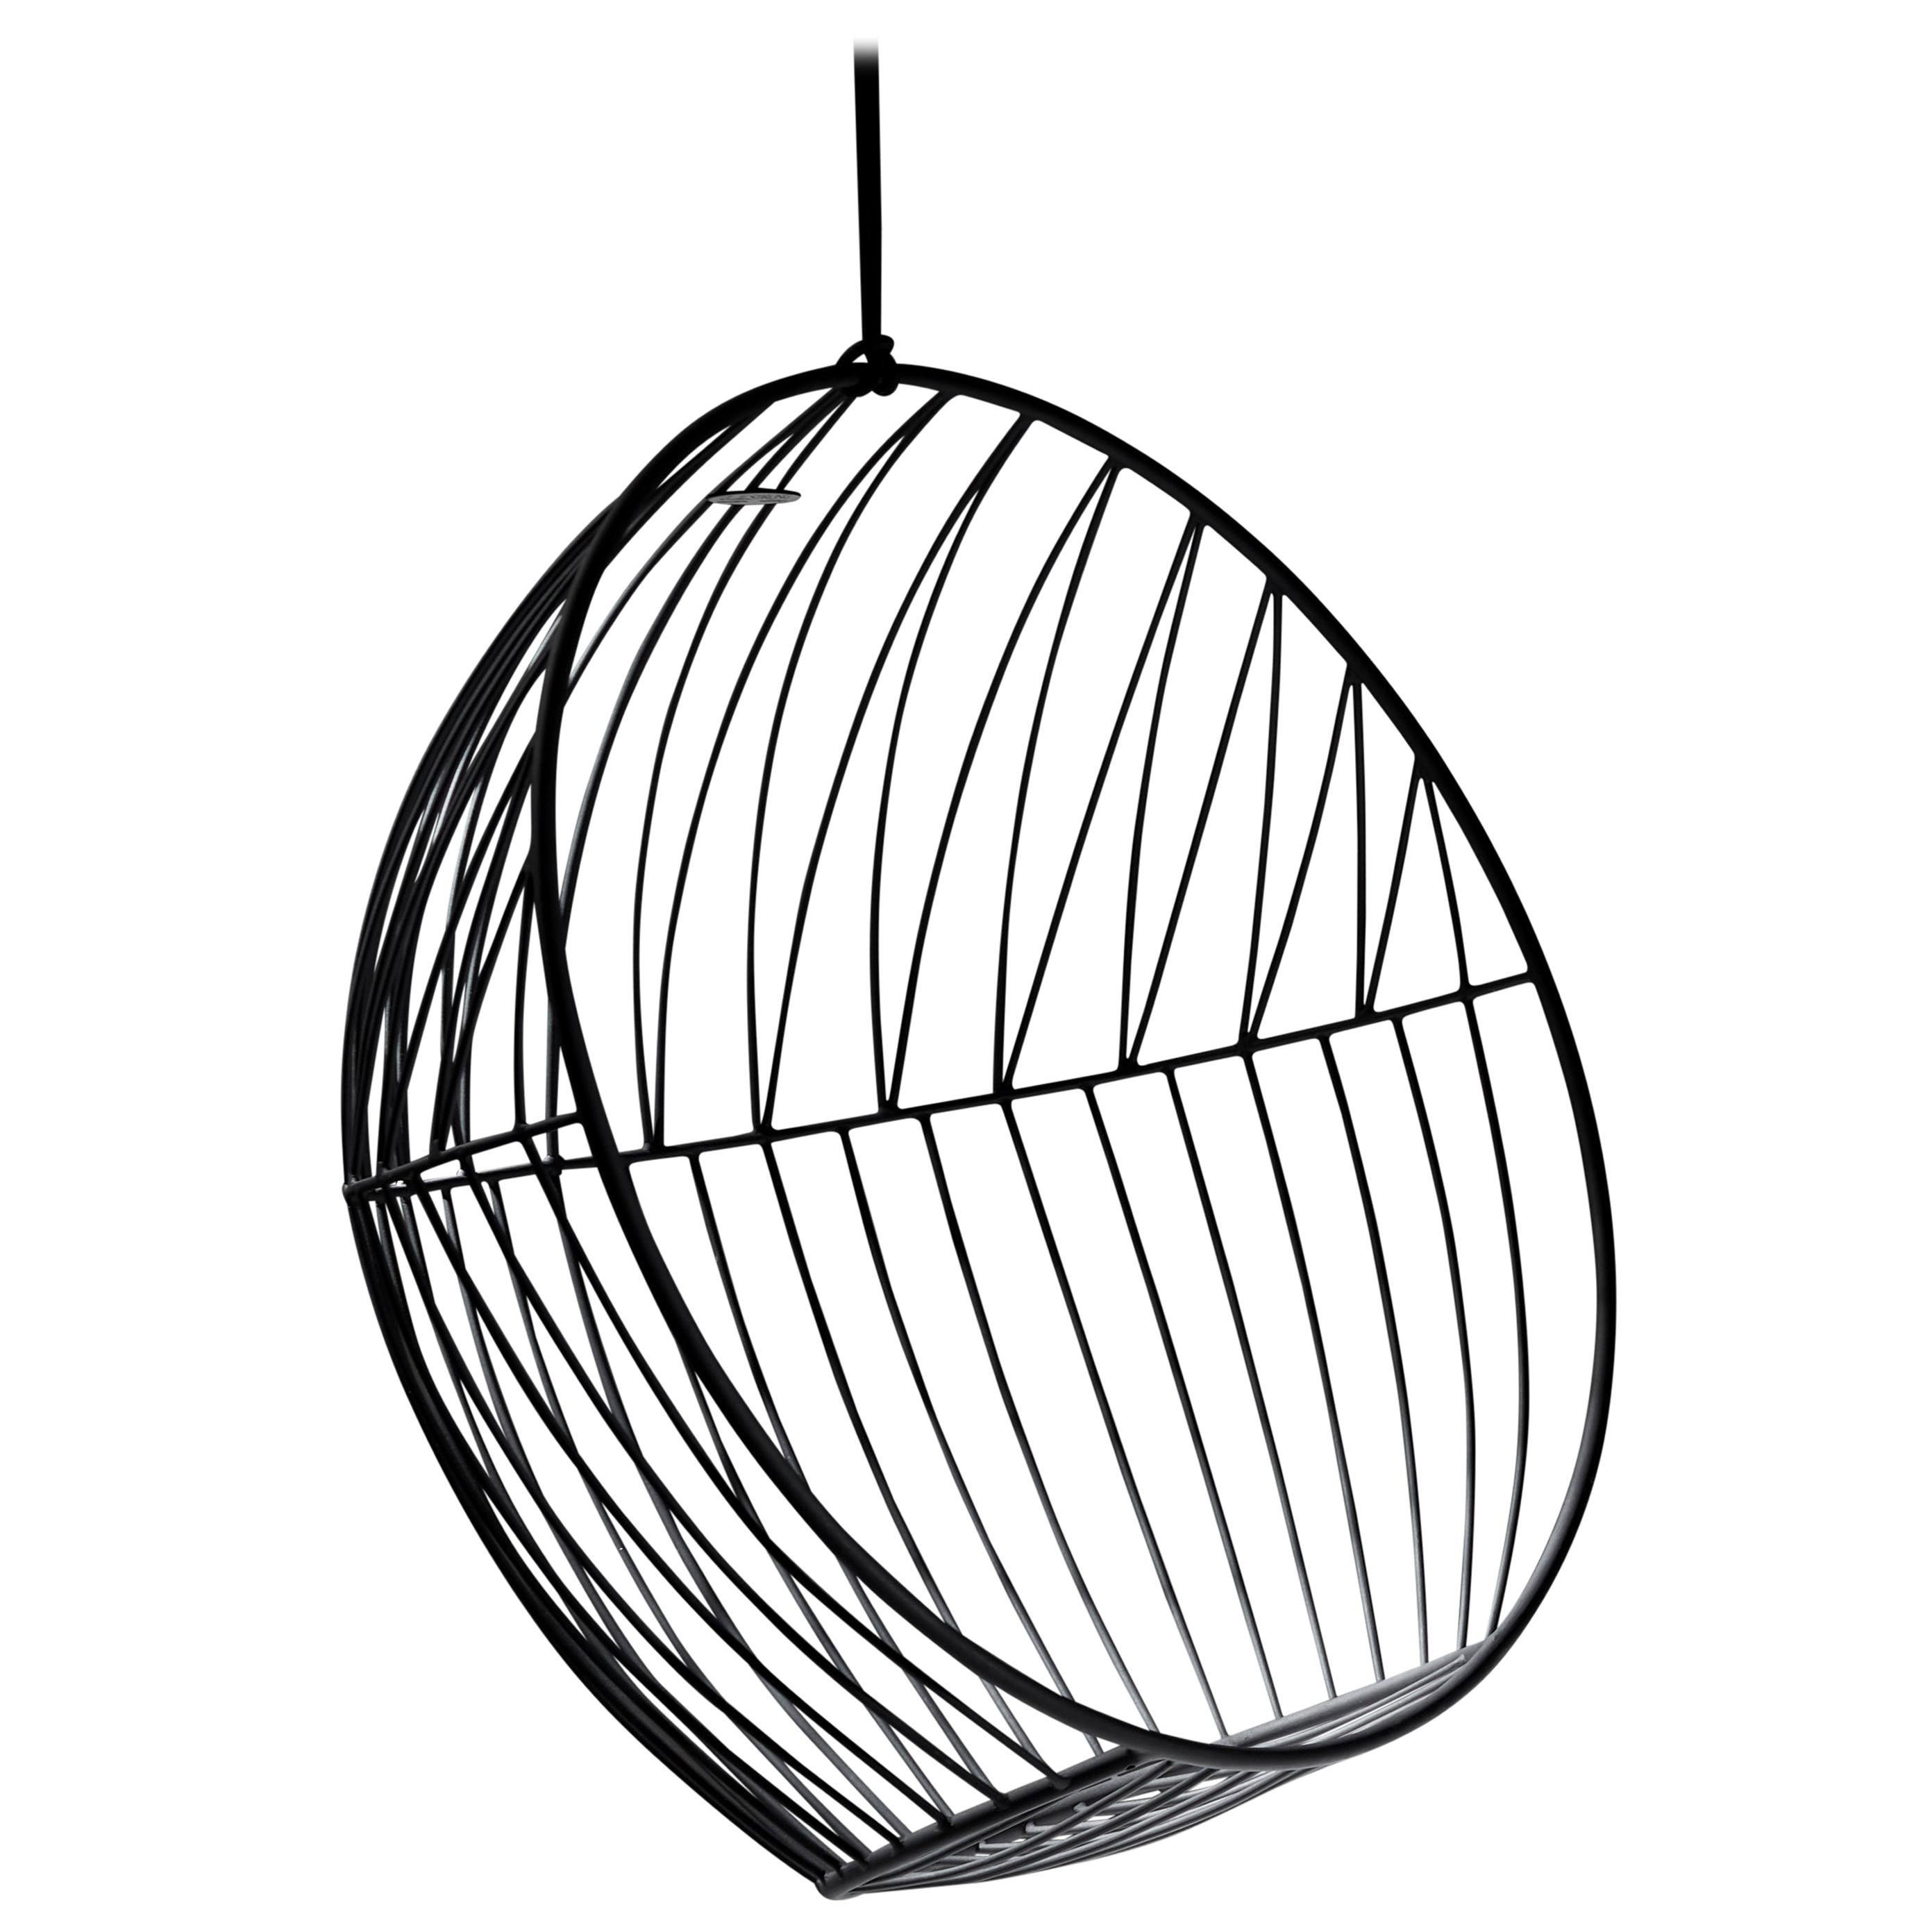 Sun Bubble Hanging Swing Chair Modern Steel In/Outdoor Black, 21st Century